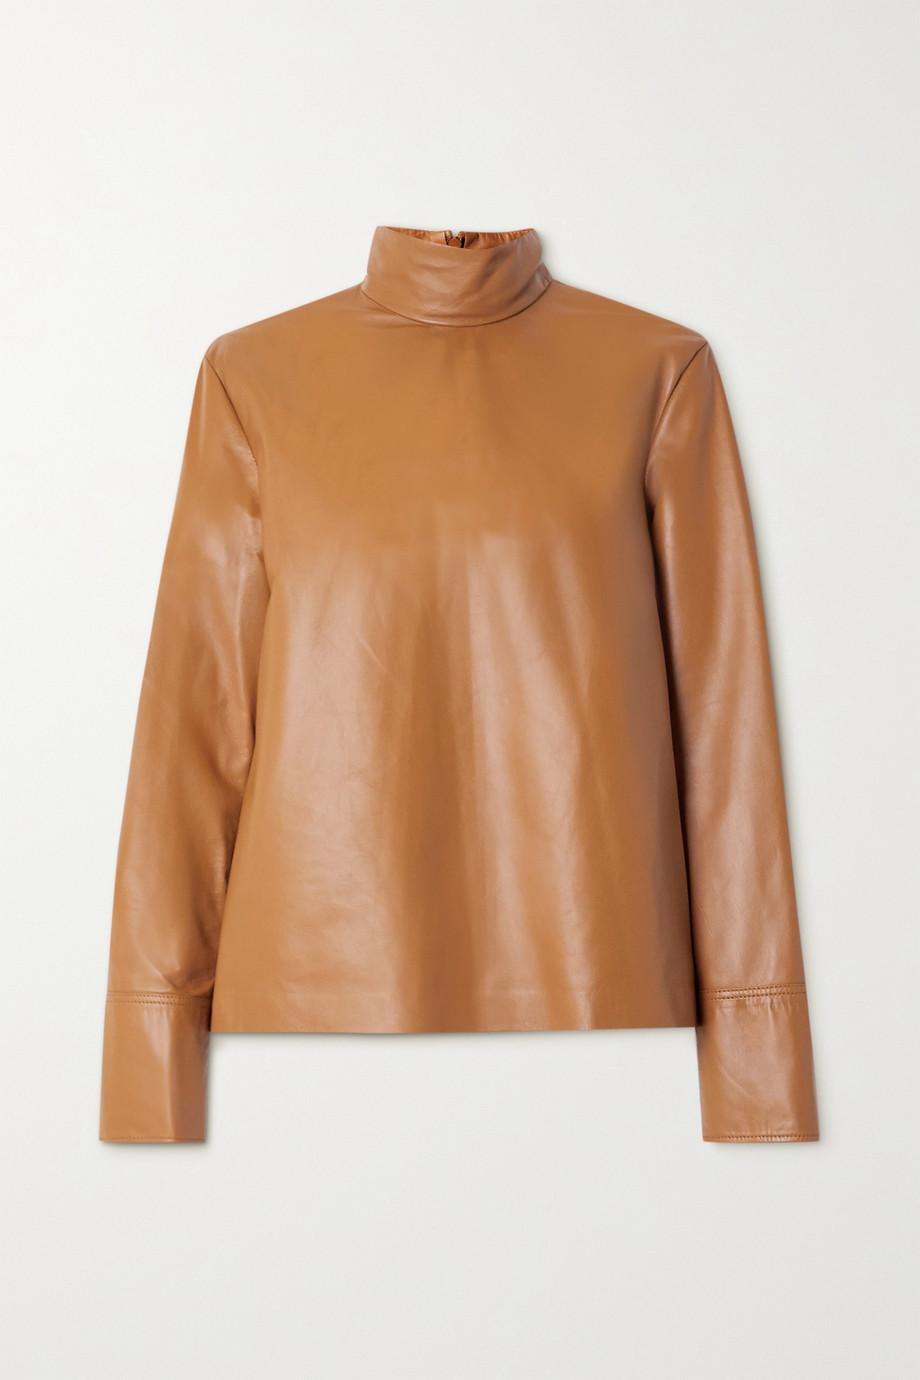 Joseph Bibo leather turtleneck top